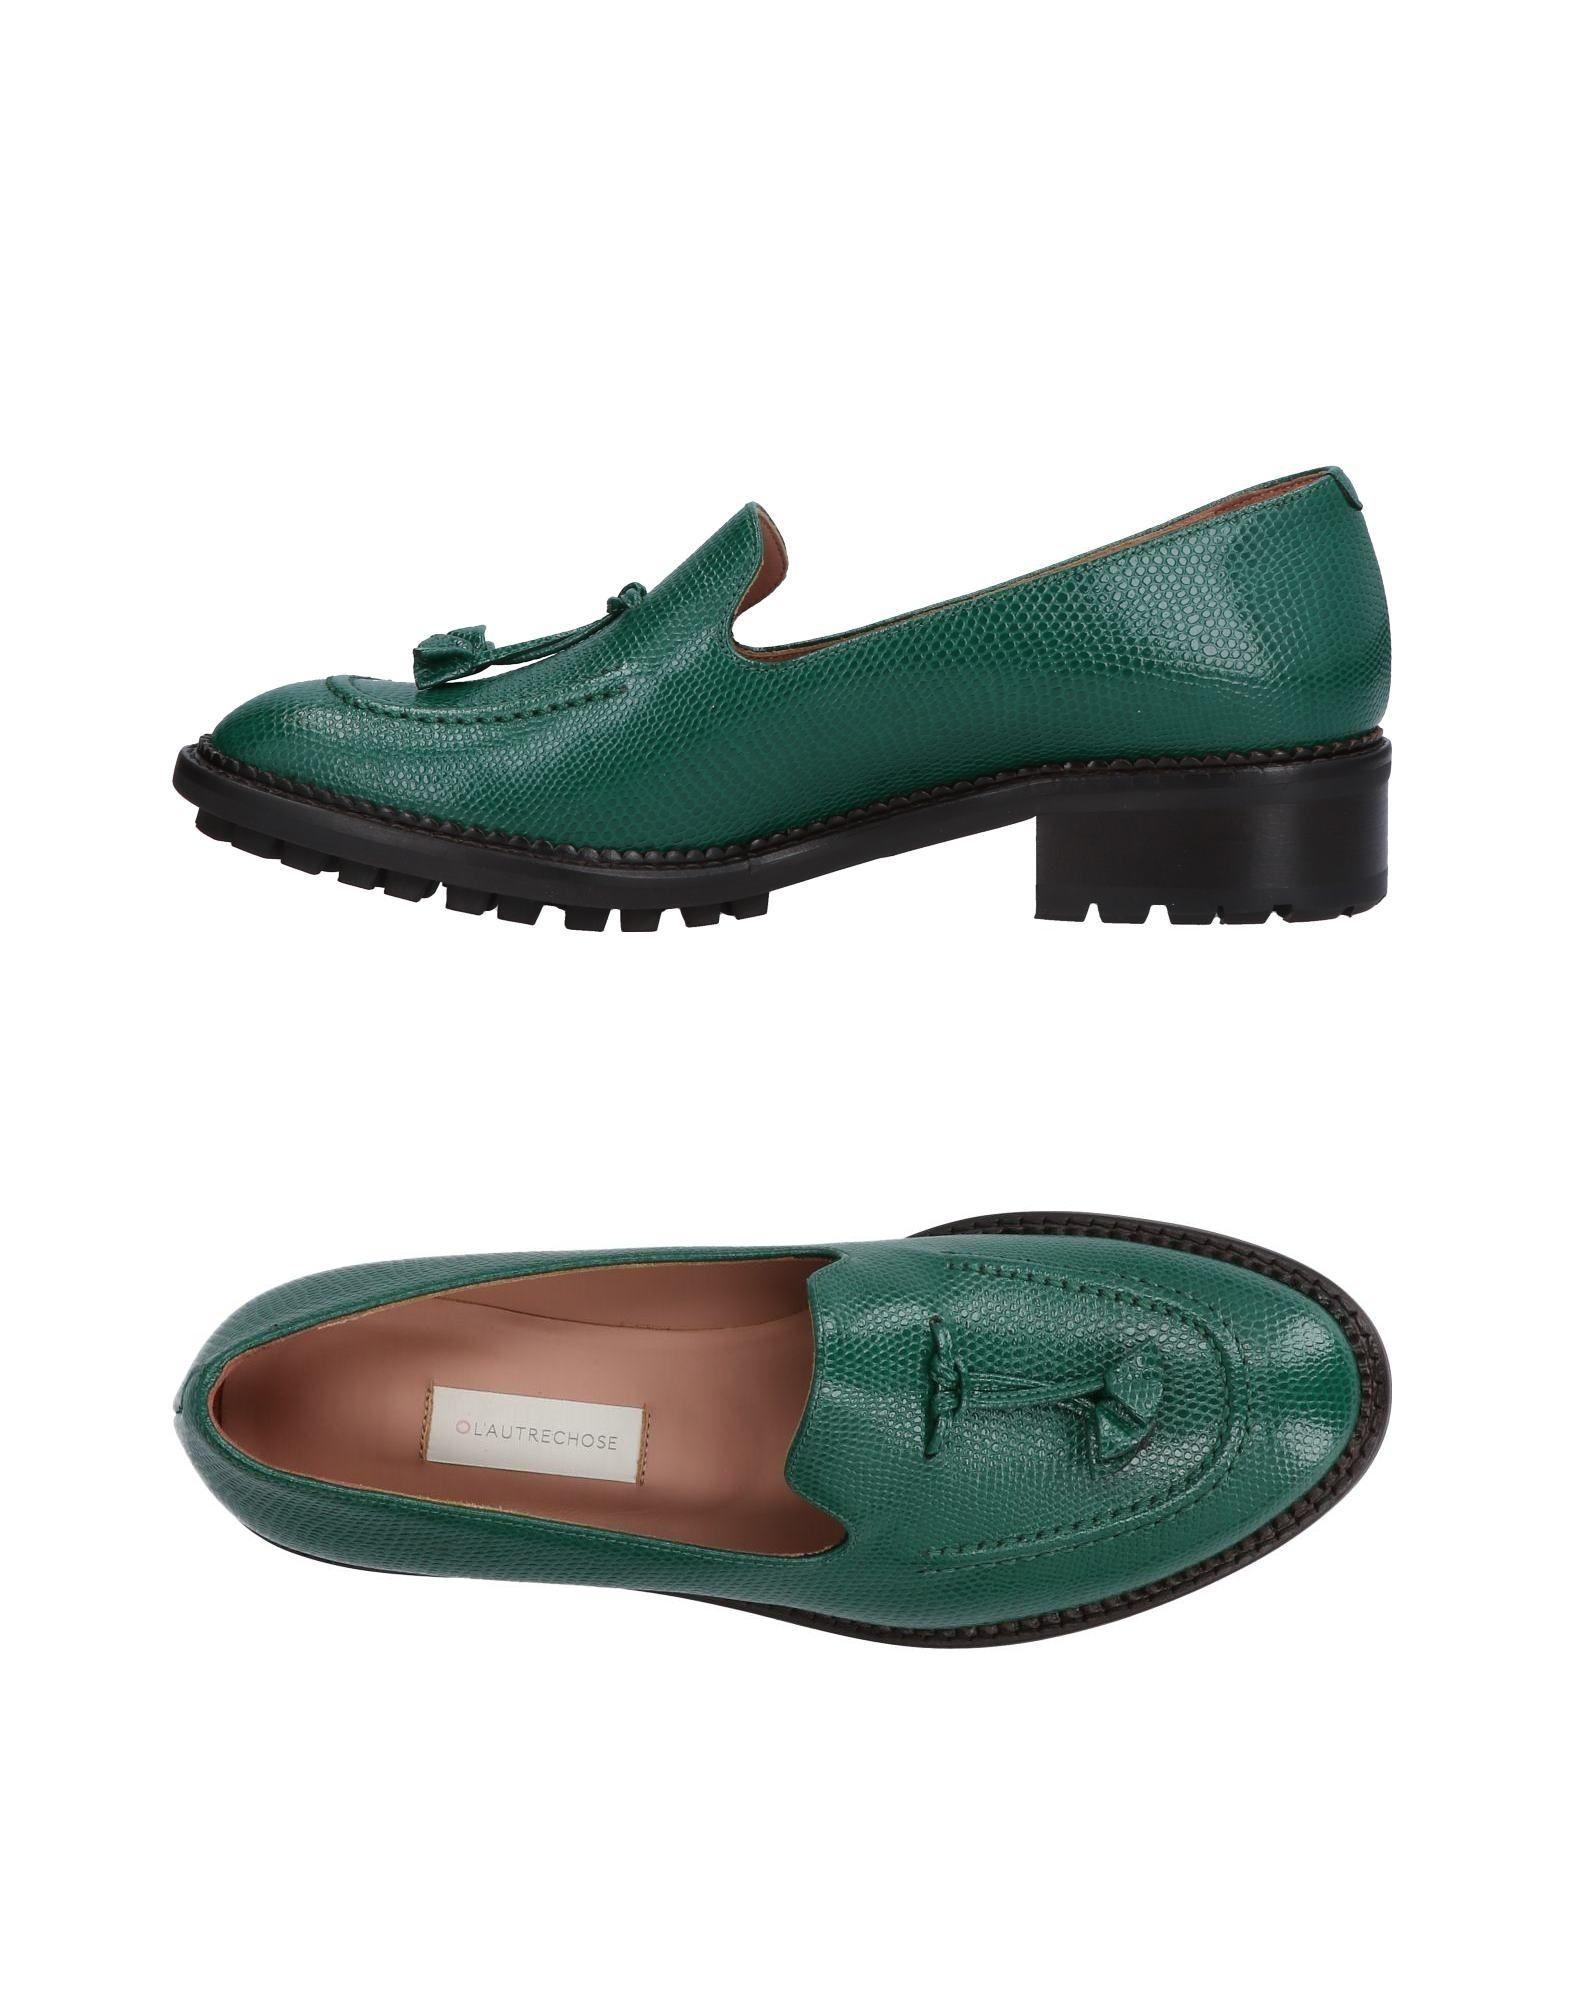 L' Autre Chose Mokassins Damen  11485033XPGut 11485033XPGut 11485033XPGut aussehende strapazierfähige Schuhe f957cc